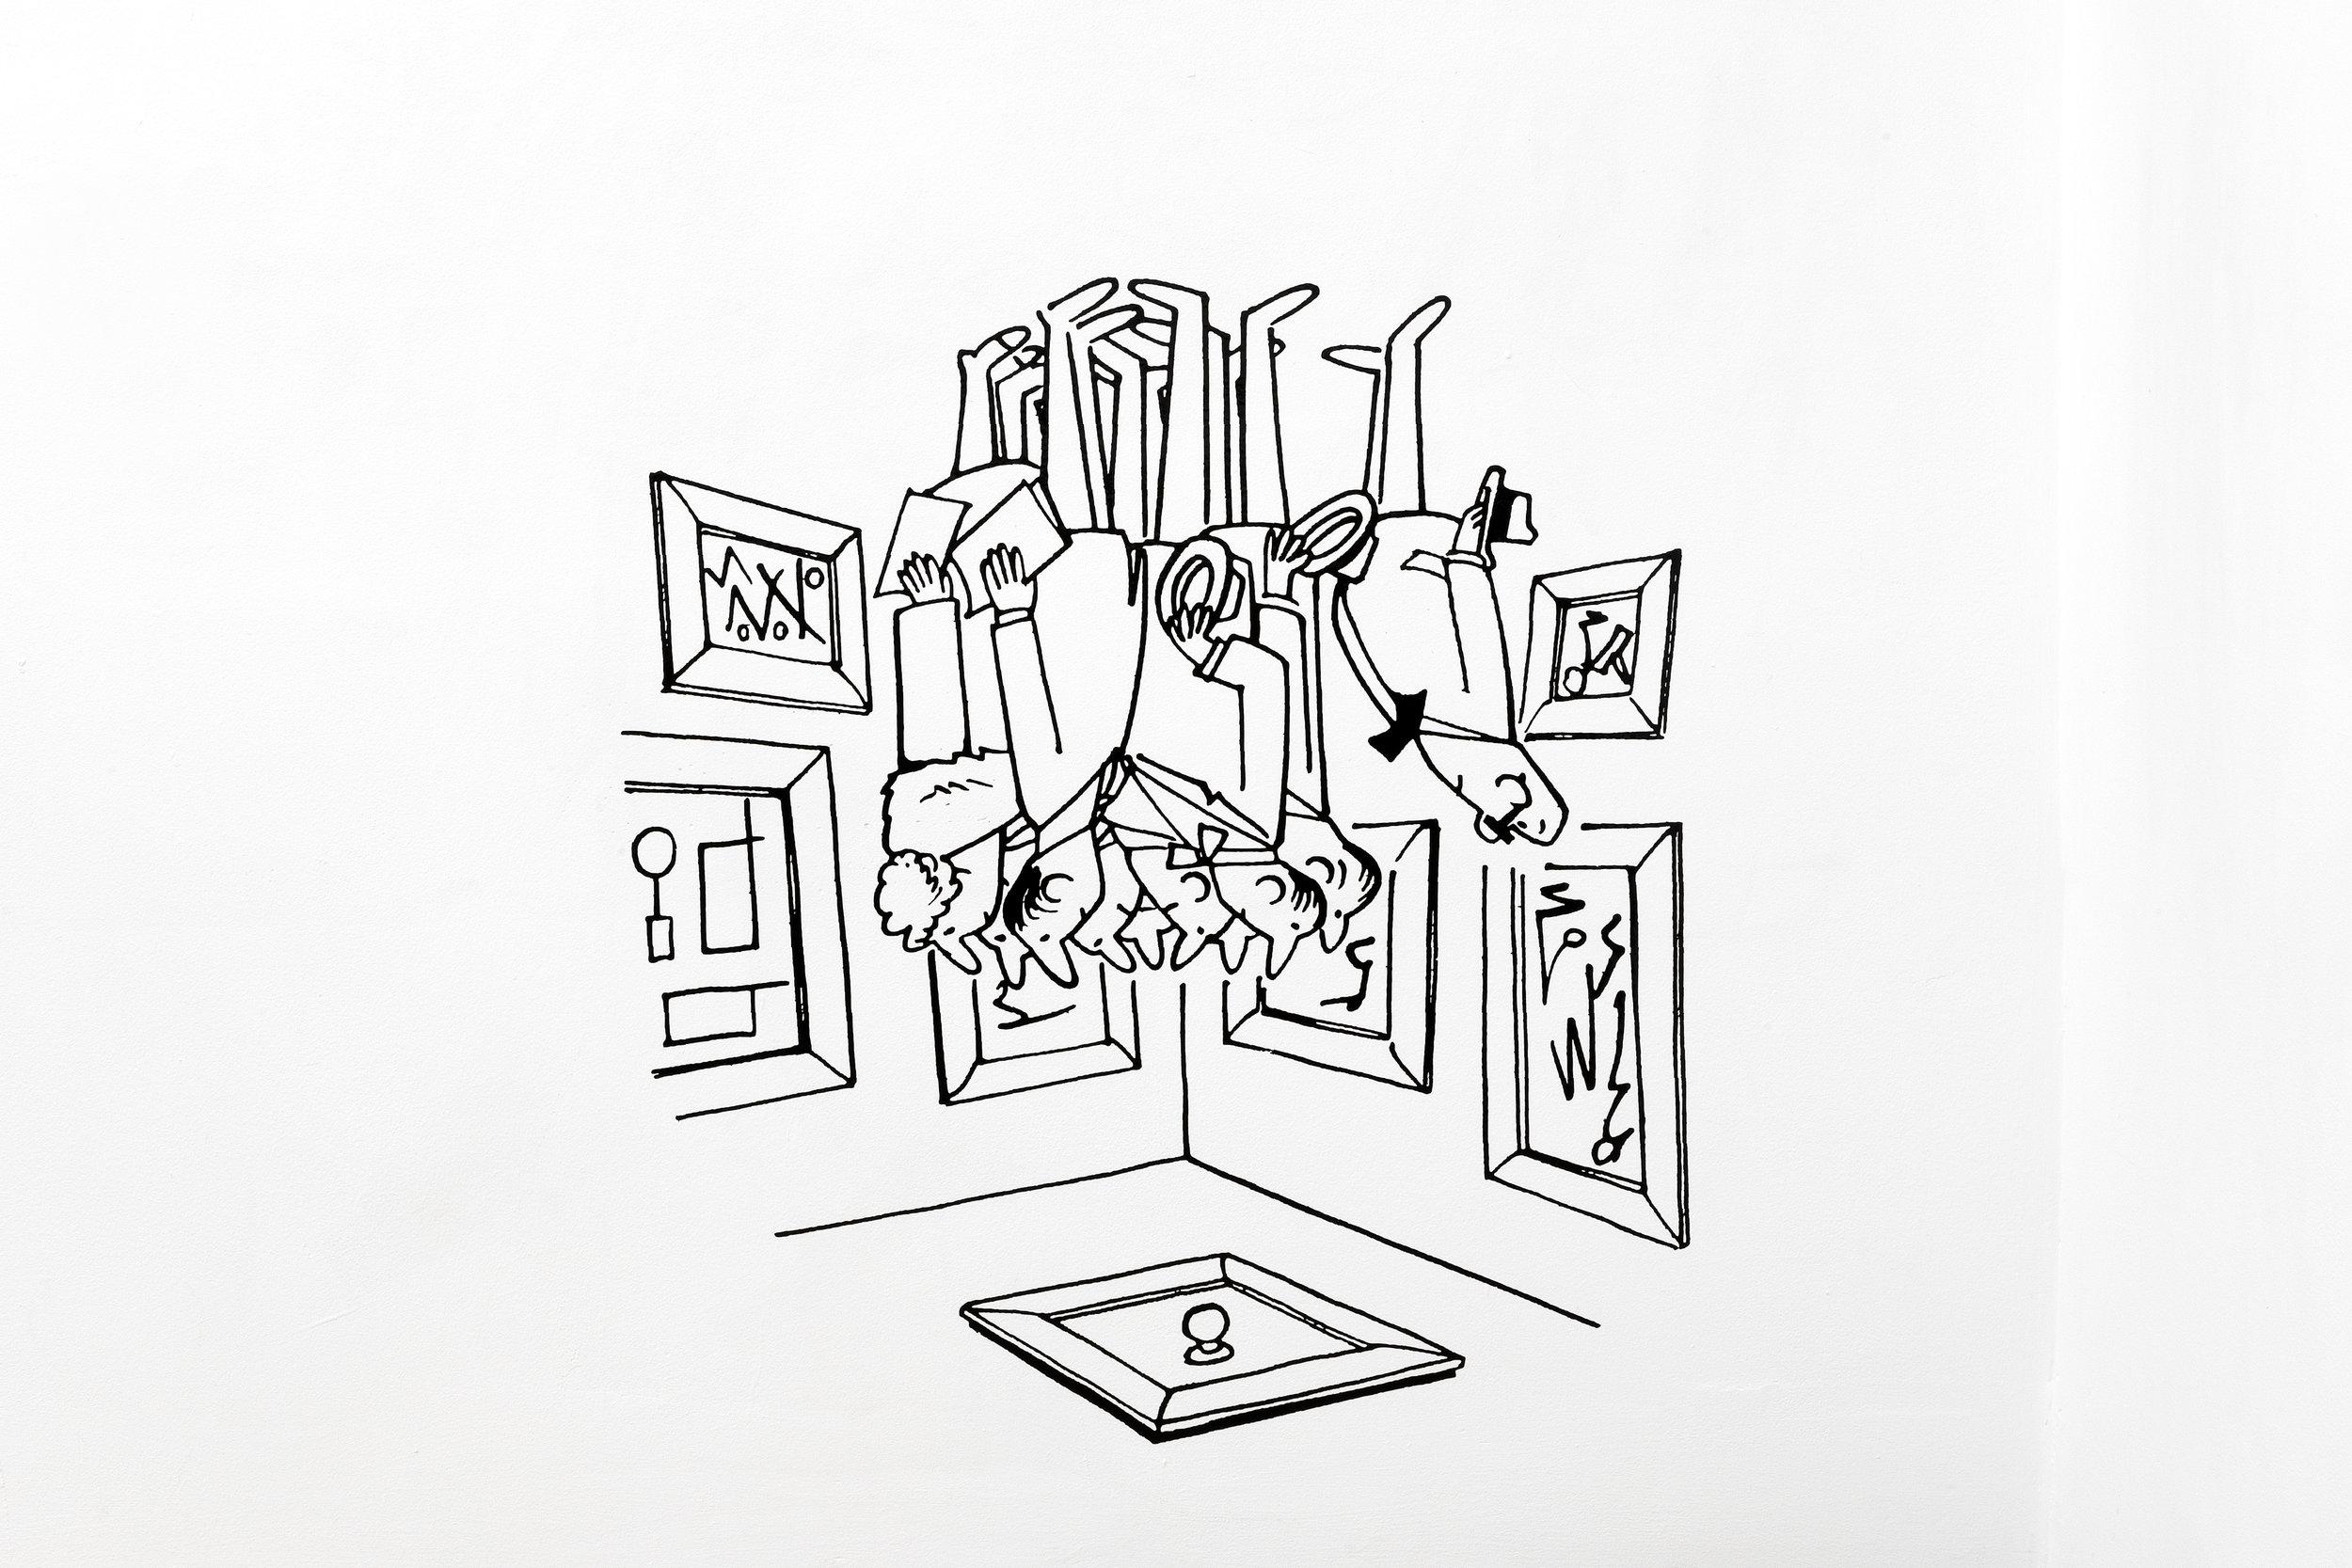 Jesse Harris,  Detournement , 2019 Unique, Cut Vinyl Deca, 26 x 24 in (66 x 61 cm)